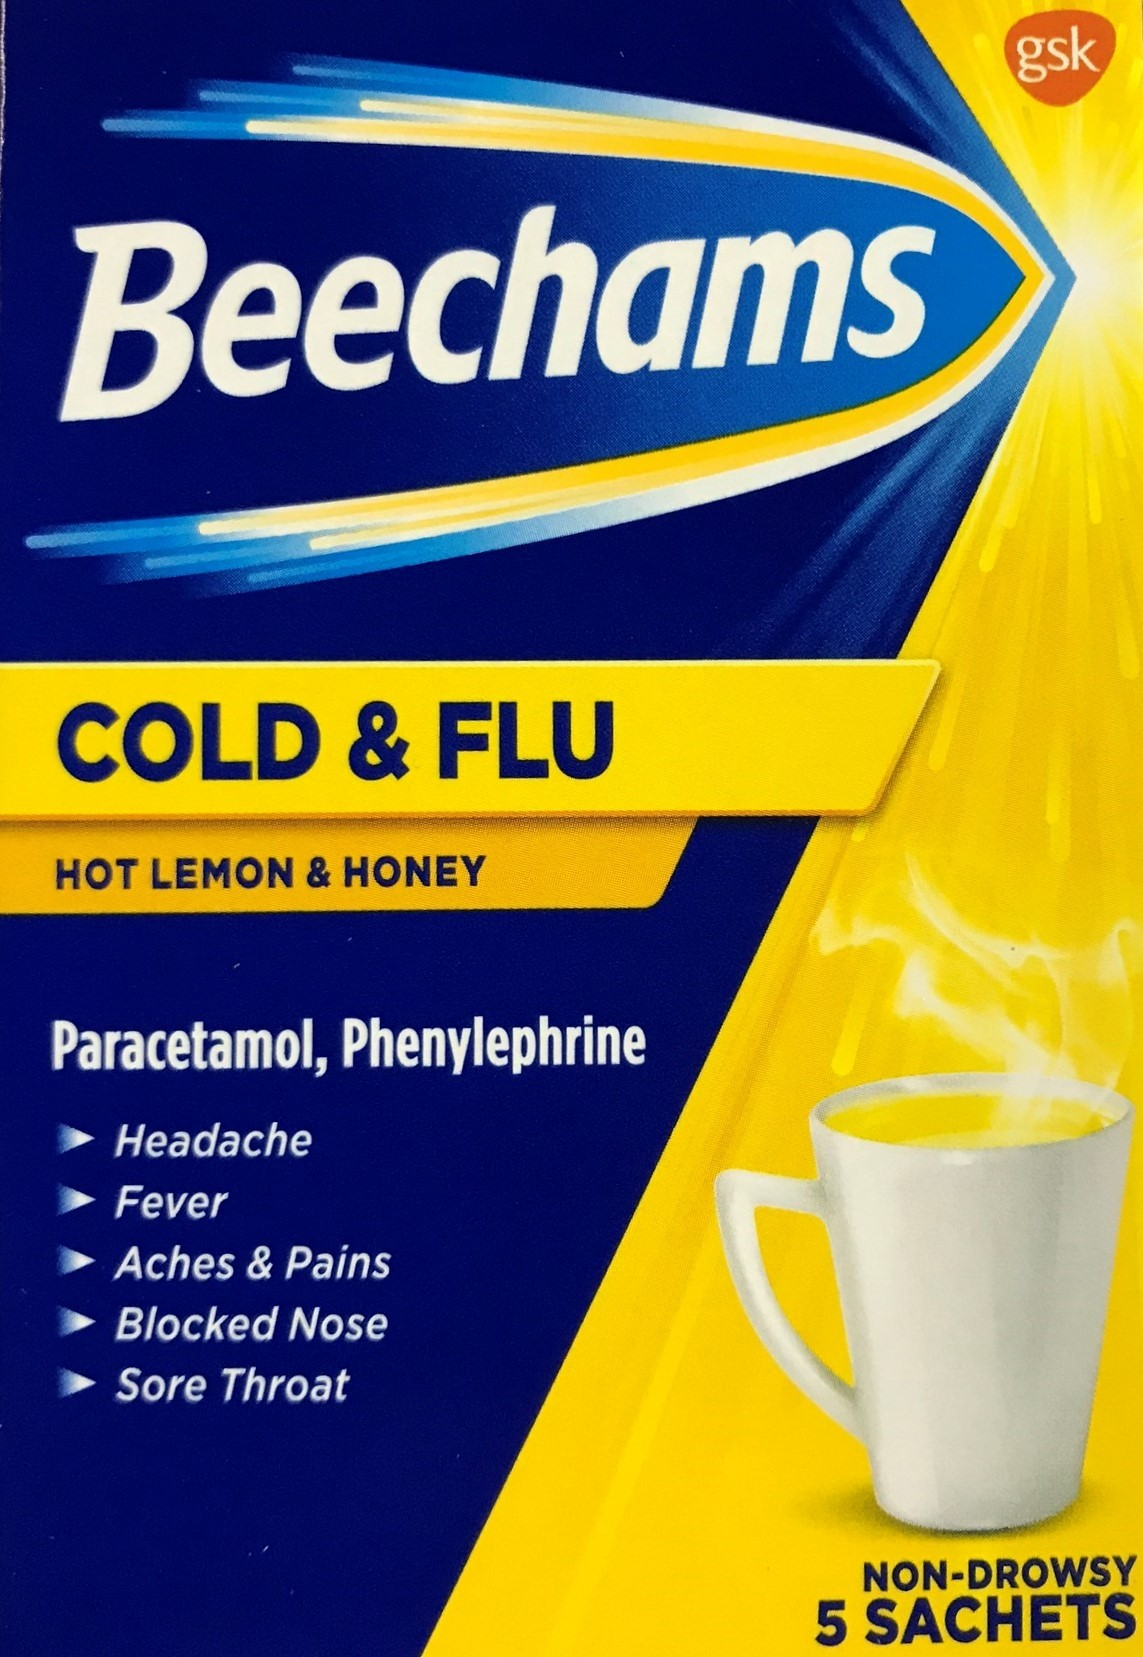 Beechams Lemon and Honey